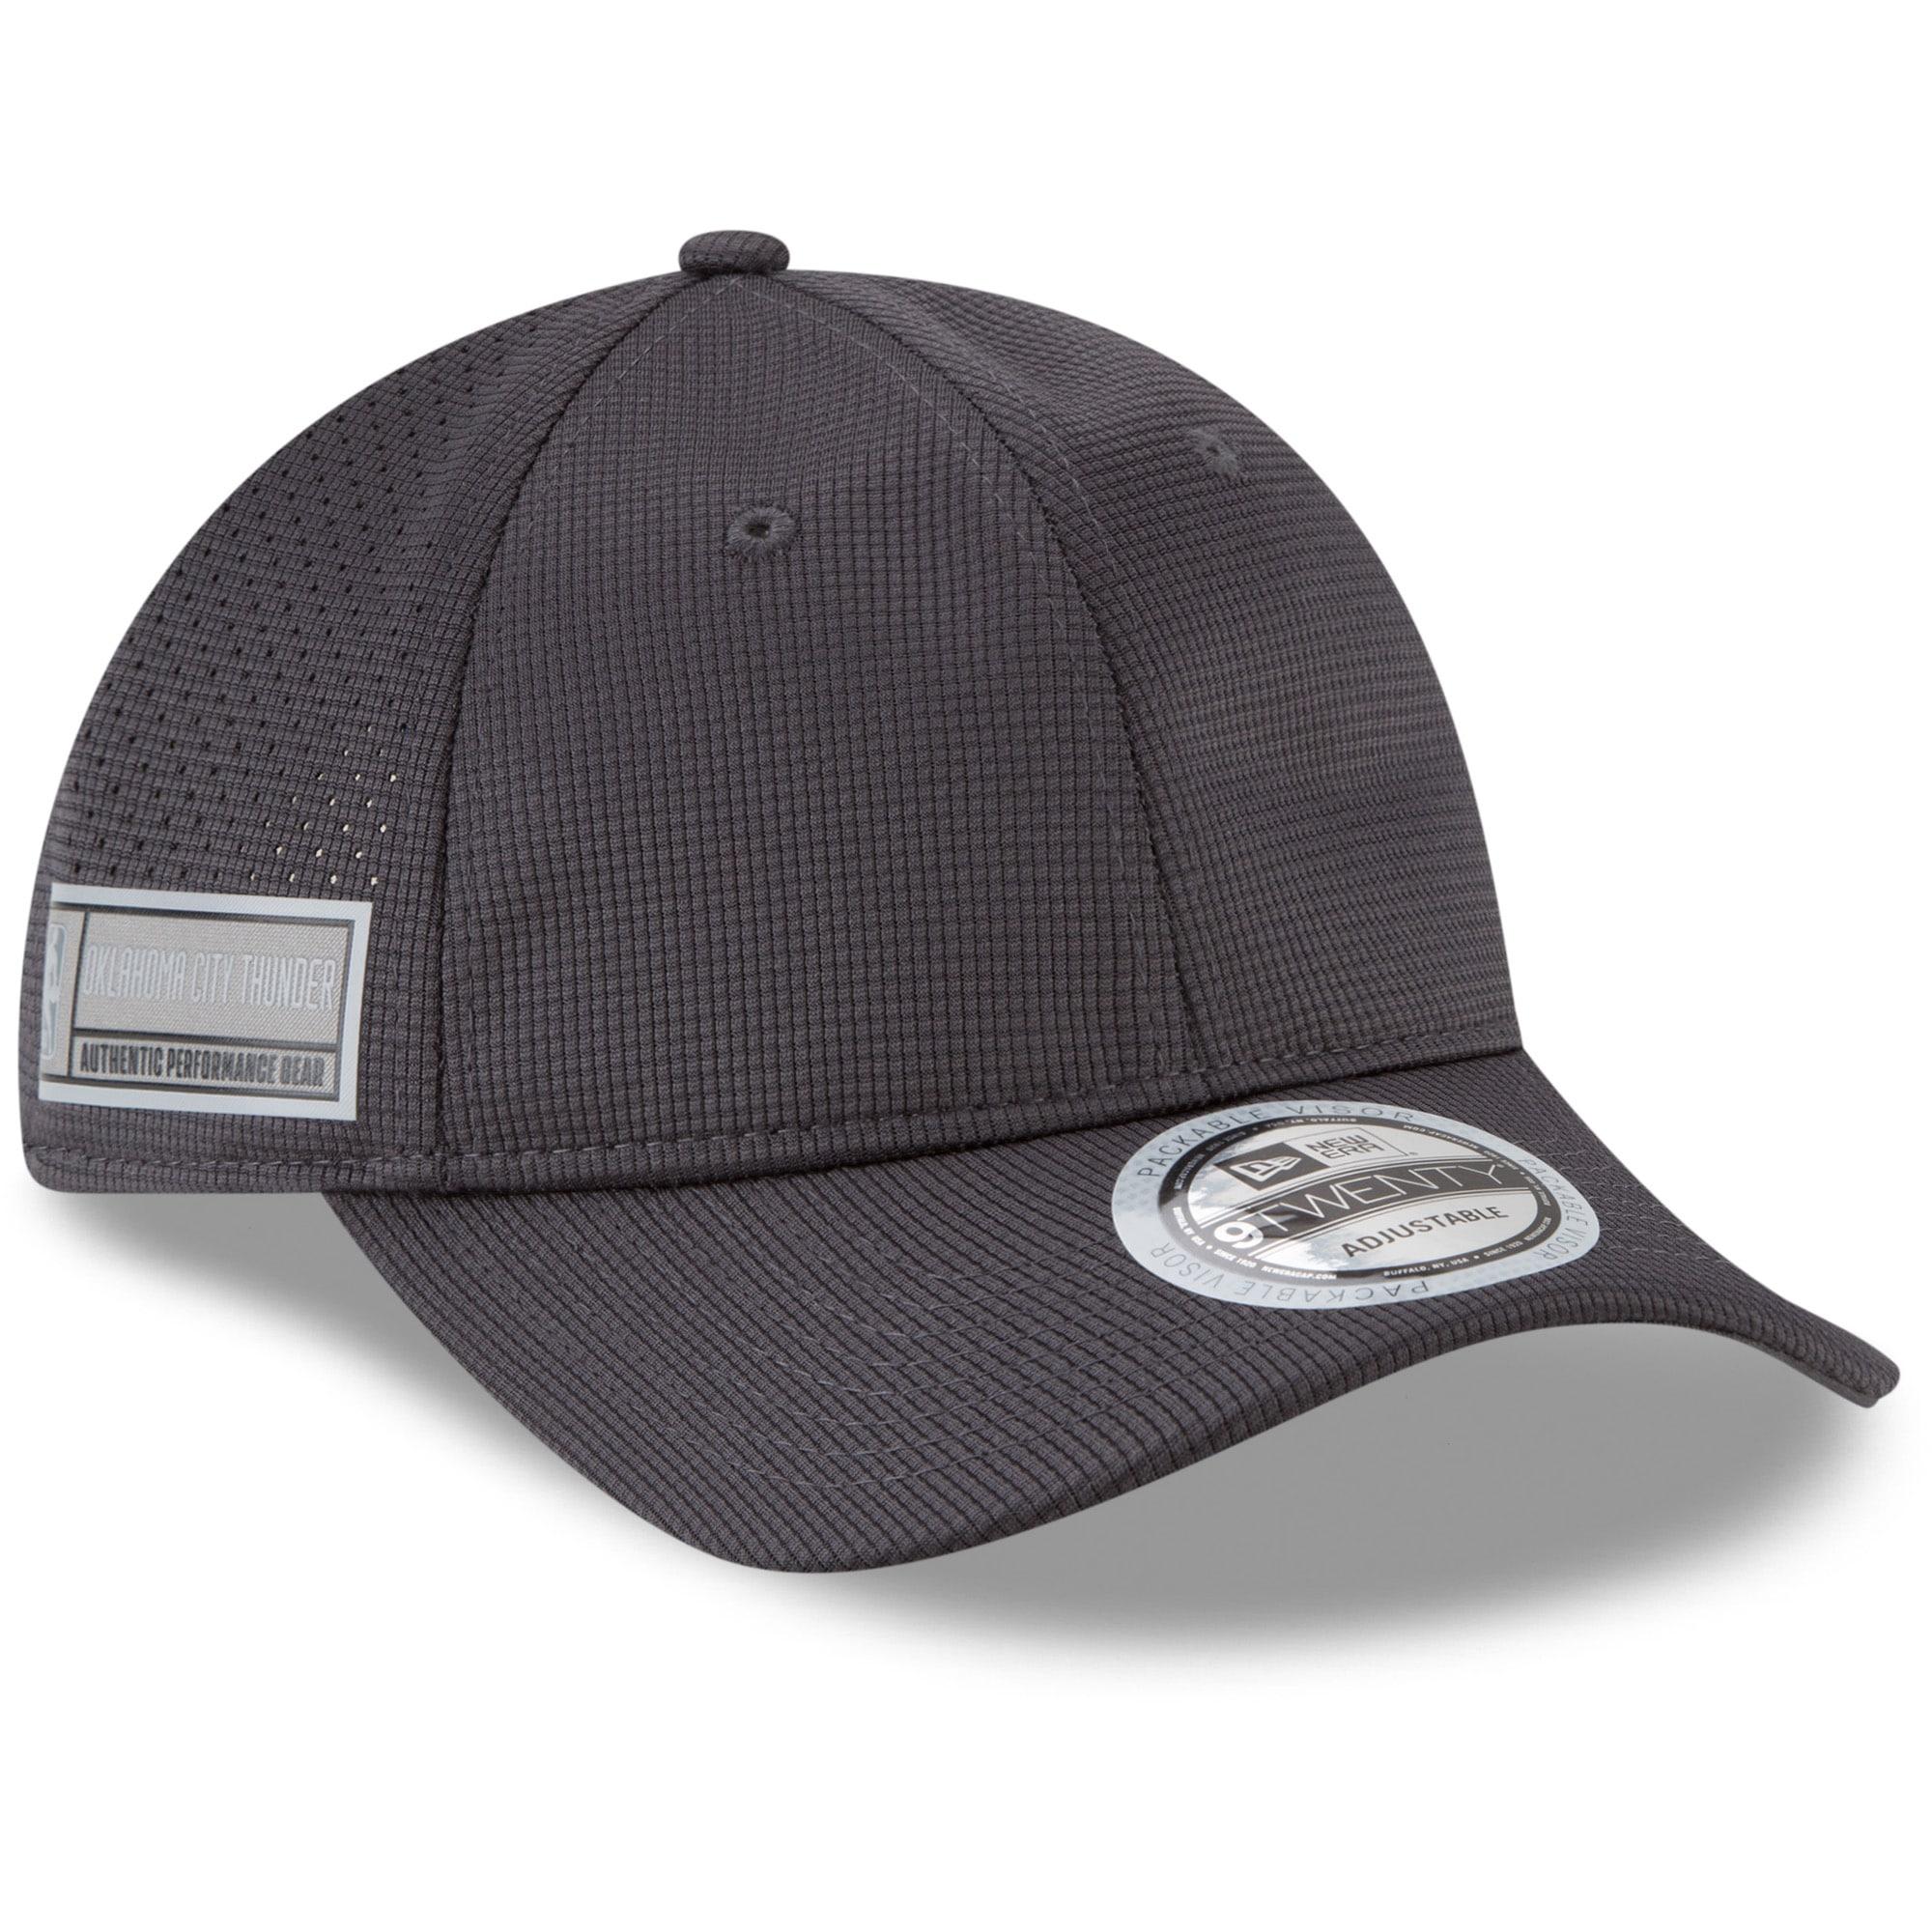 Oklahoma City Thunder New Era Authentics Training 9TWENTY Adjustable Hat - Graphite